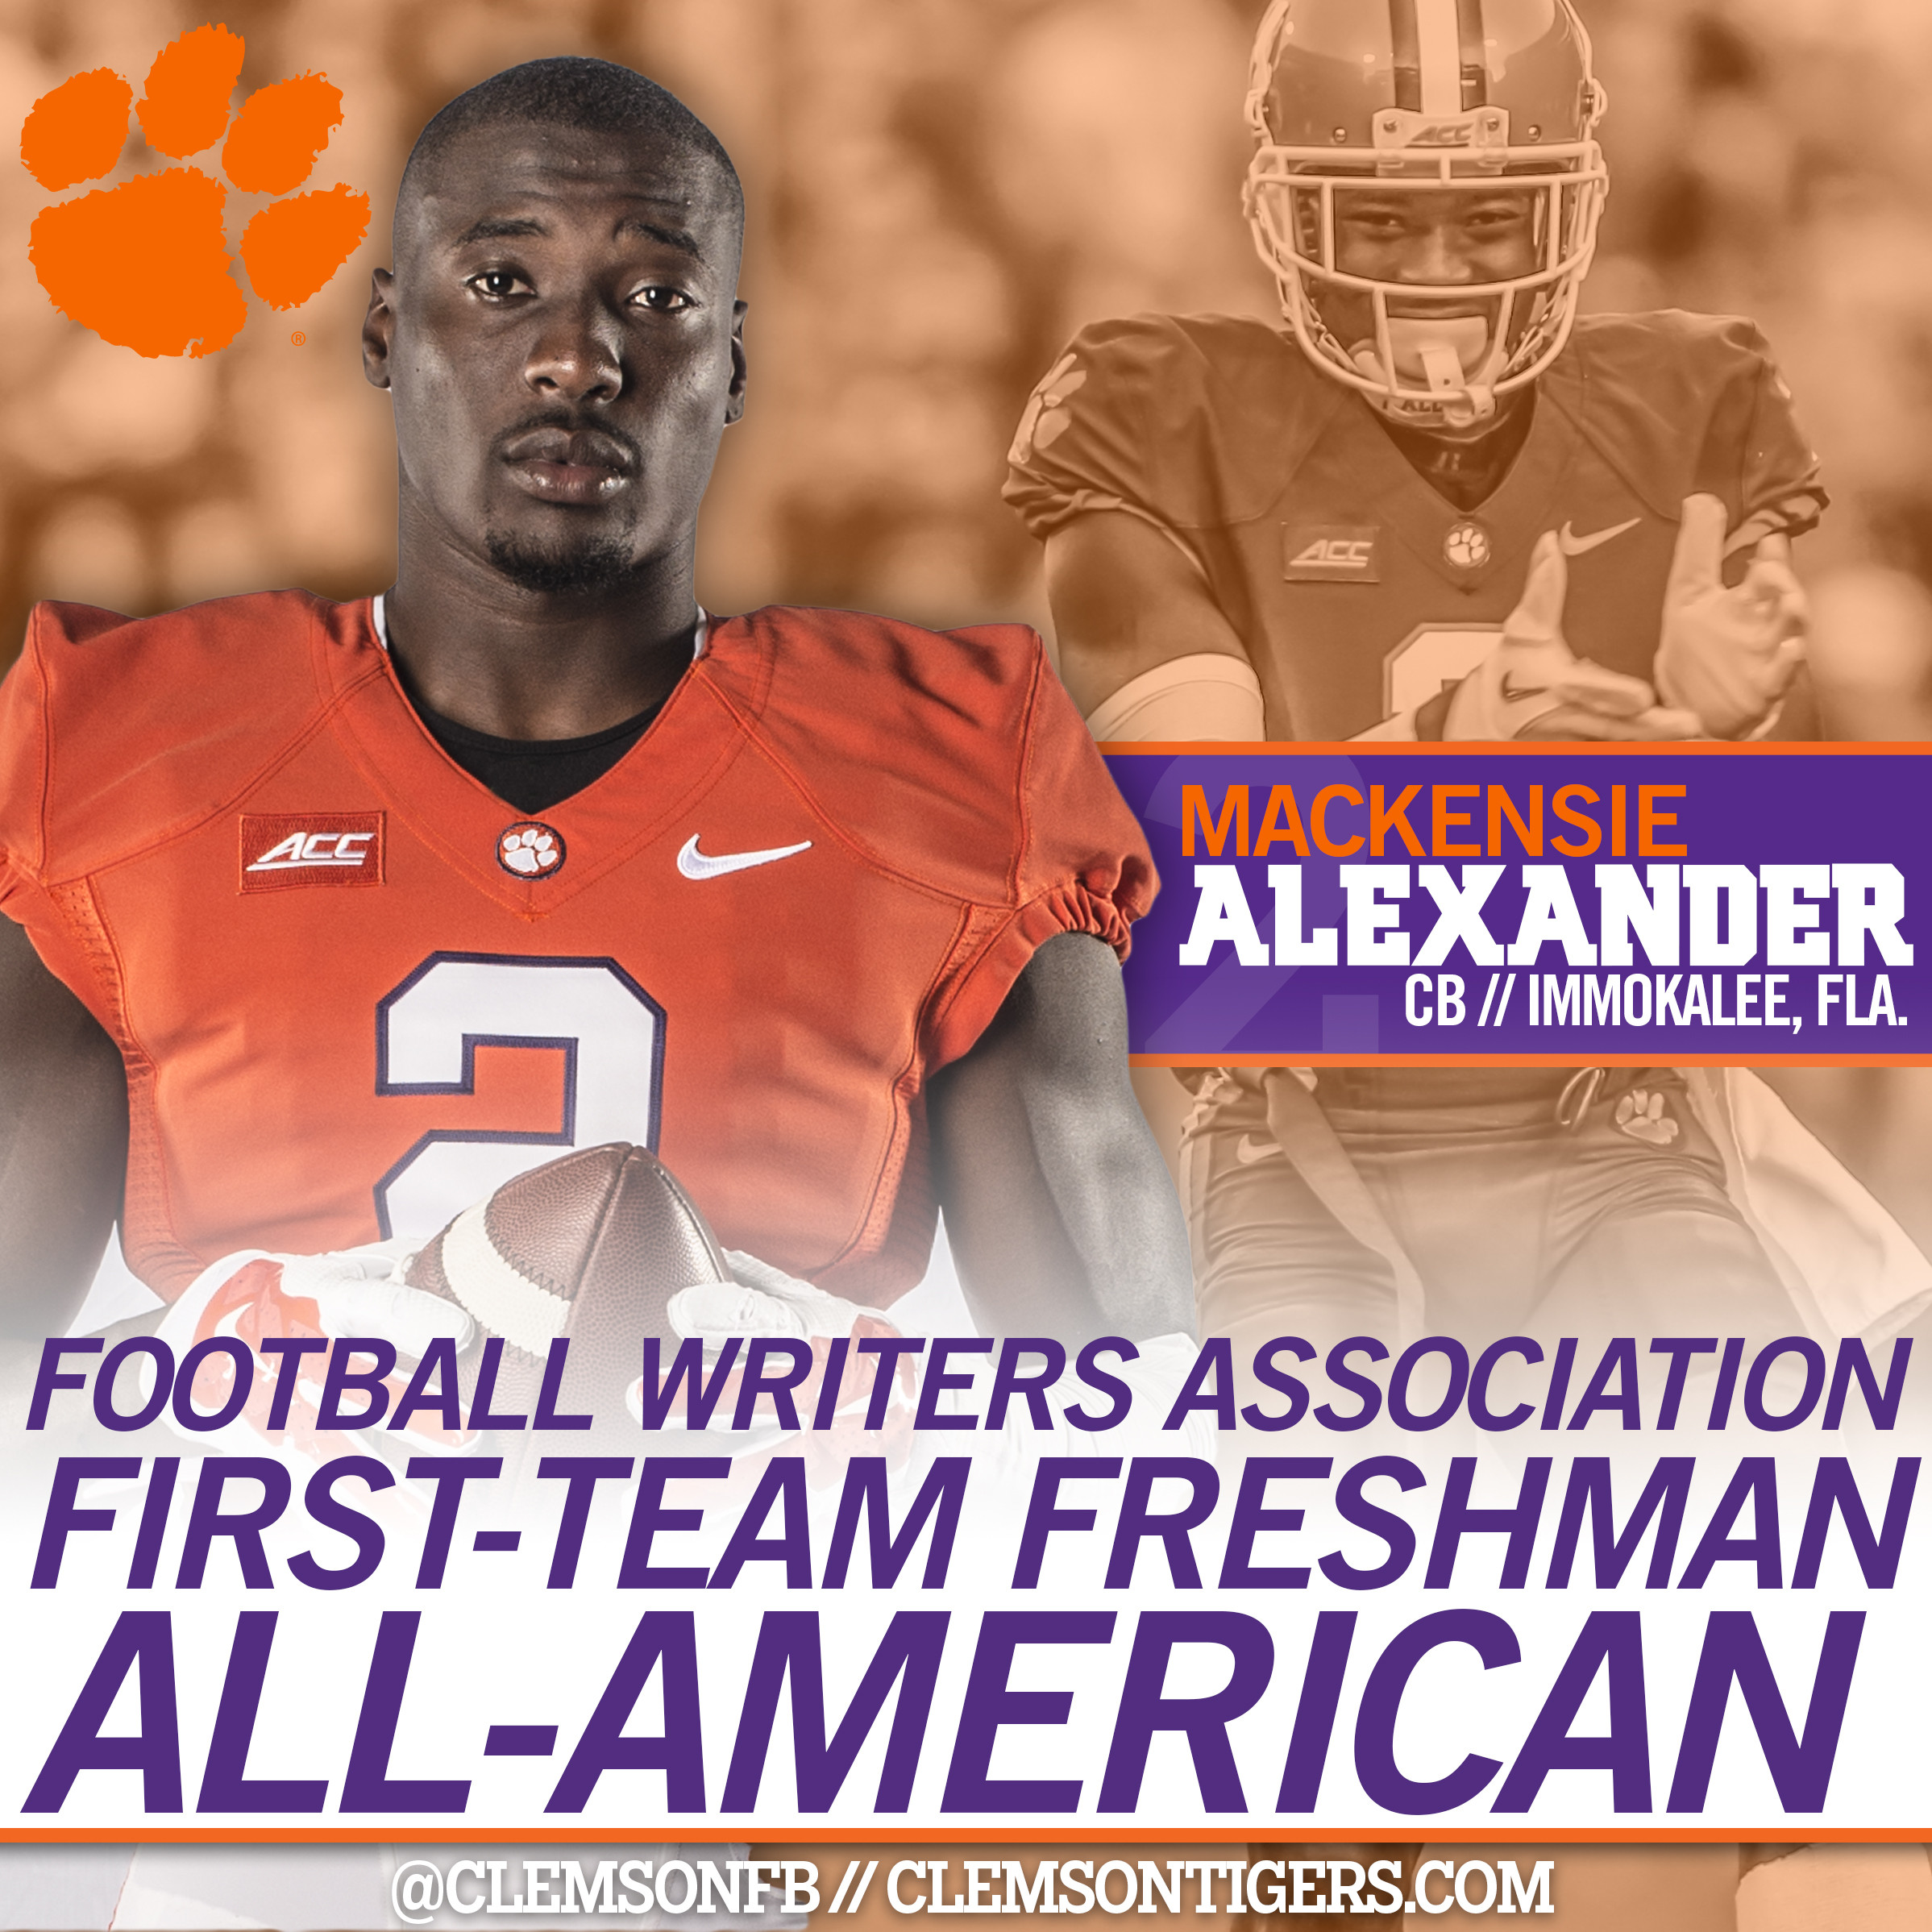 Alexander Earns First-Team Freshman All-America Honor